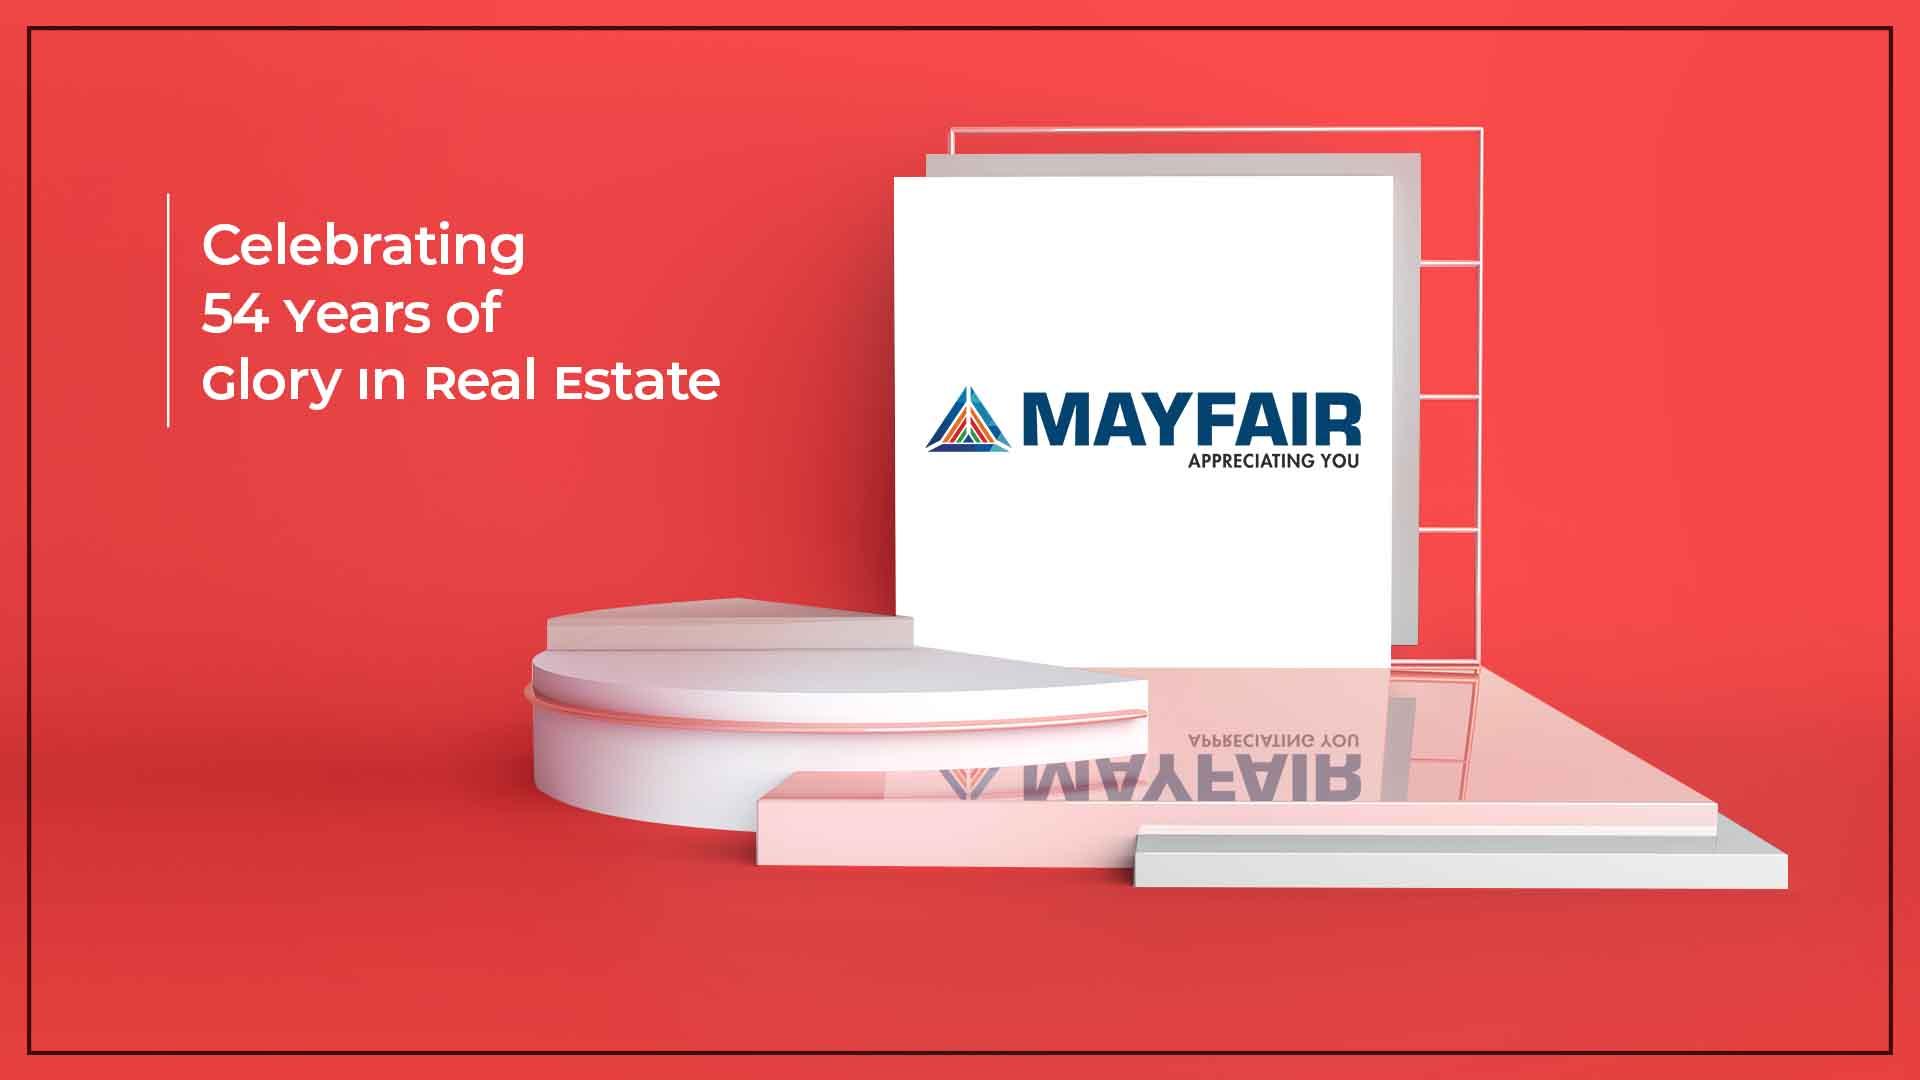 Mayfair Housing Celebrates Its 54th Anniversary